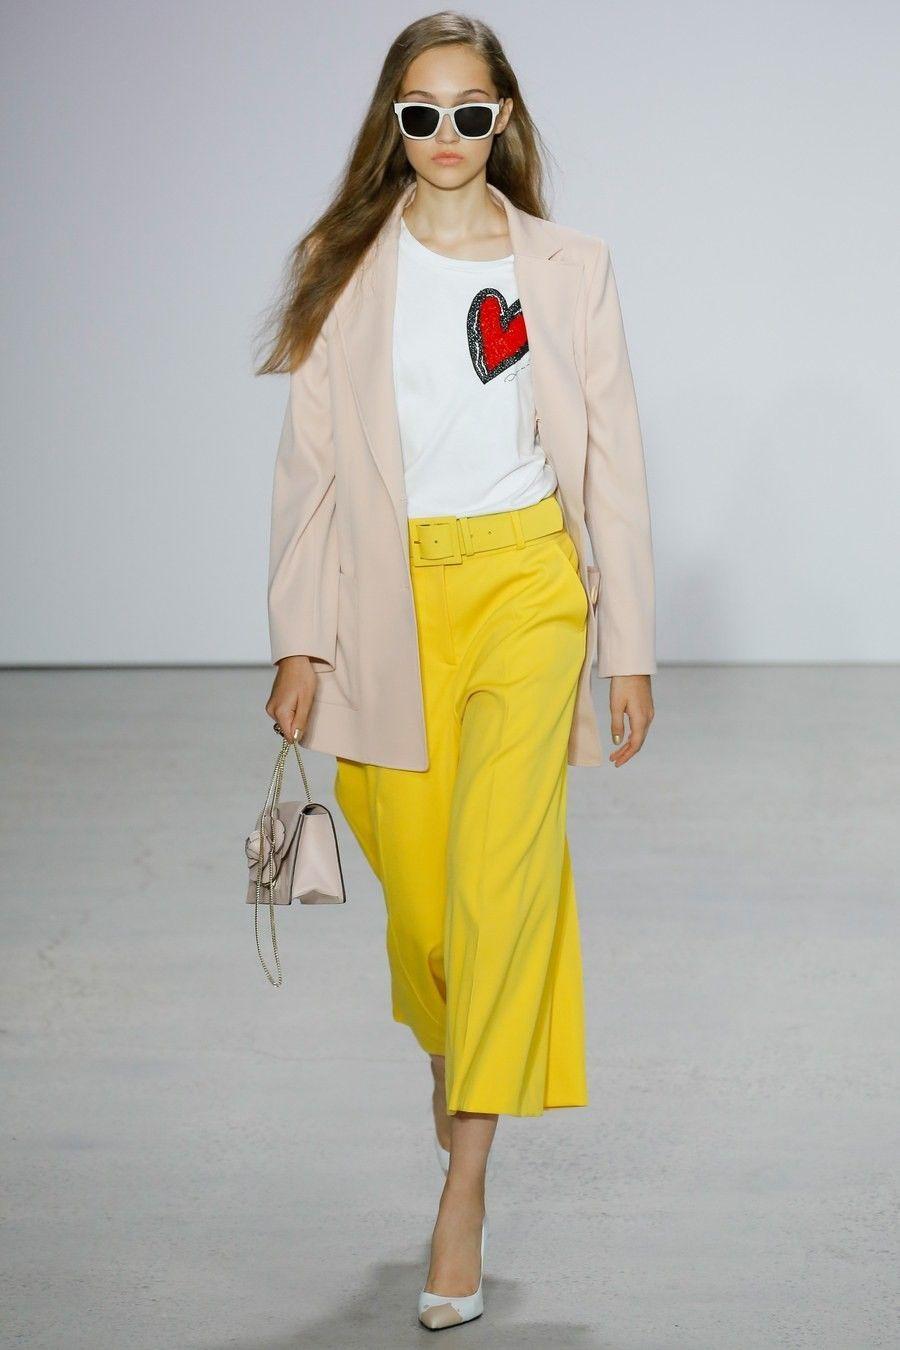 Oscar de la Renta Spring 2018 Ready-to-Wear Fashion Show - Mariacarla Boscono